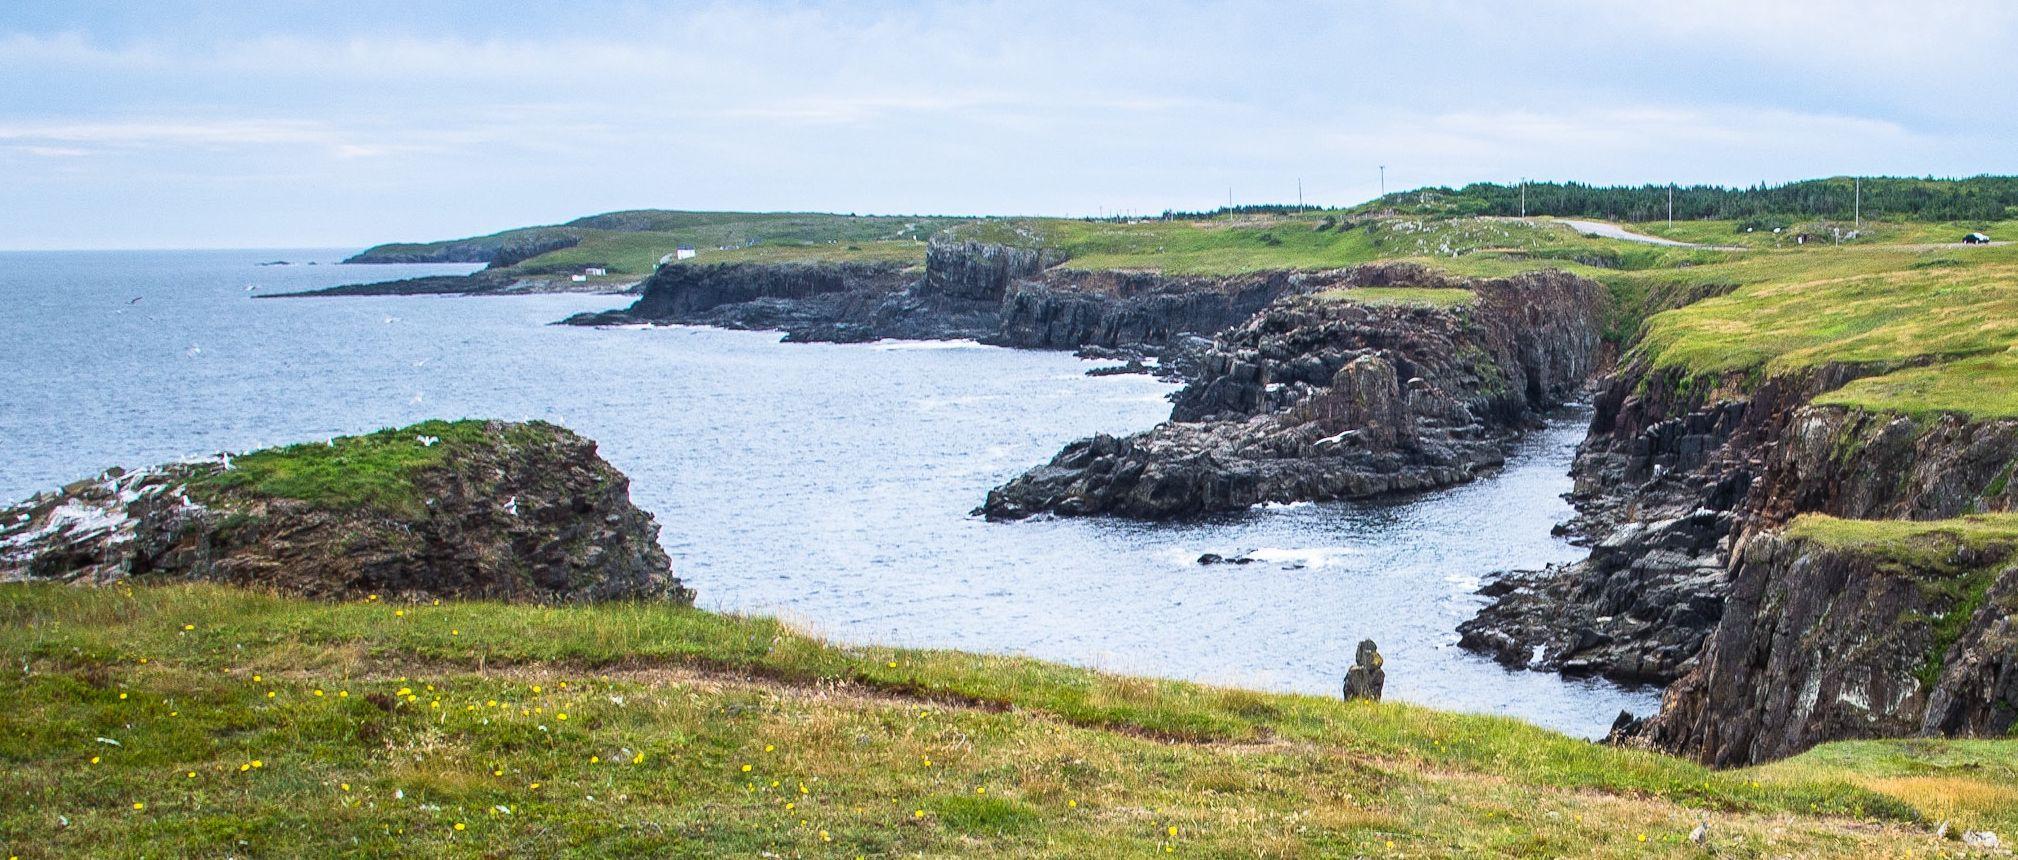 Newfoundland coastline